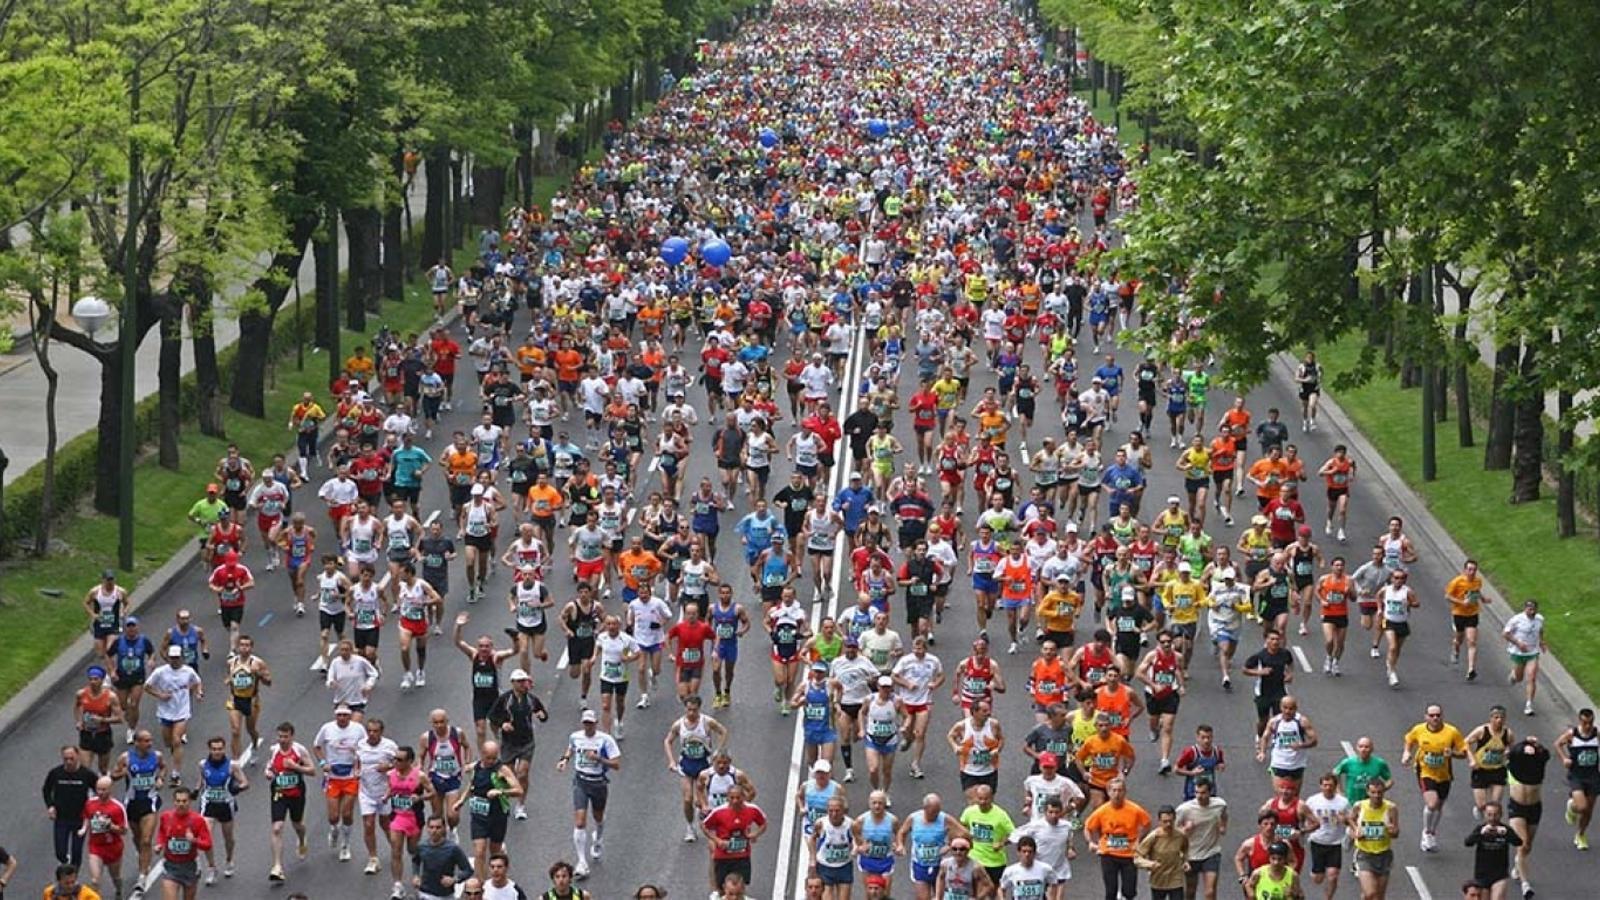 La psicologia maratoniana